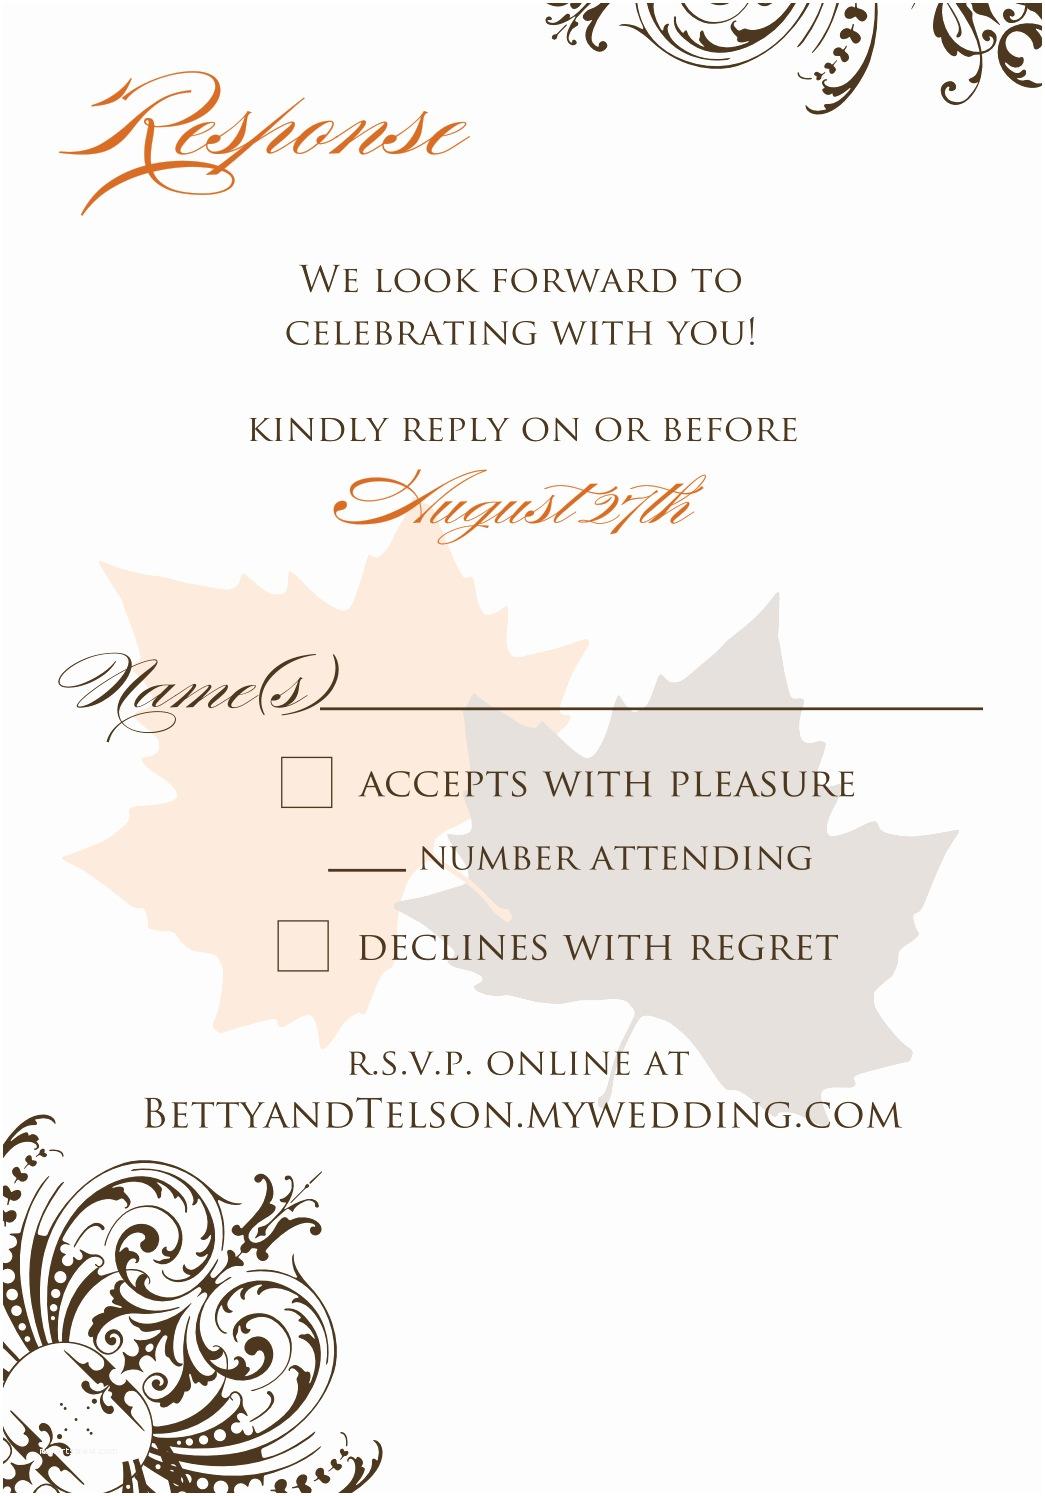 Hilarious Wedding Invitation Wording Funny Wedding Invitation Verses Yaseen for